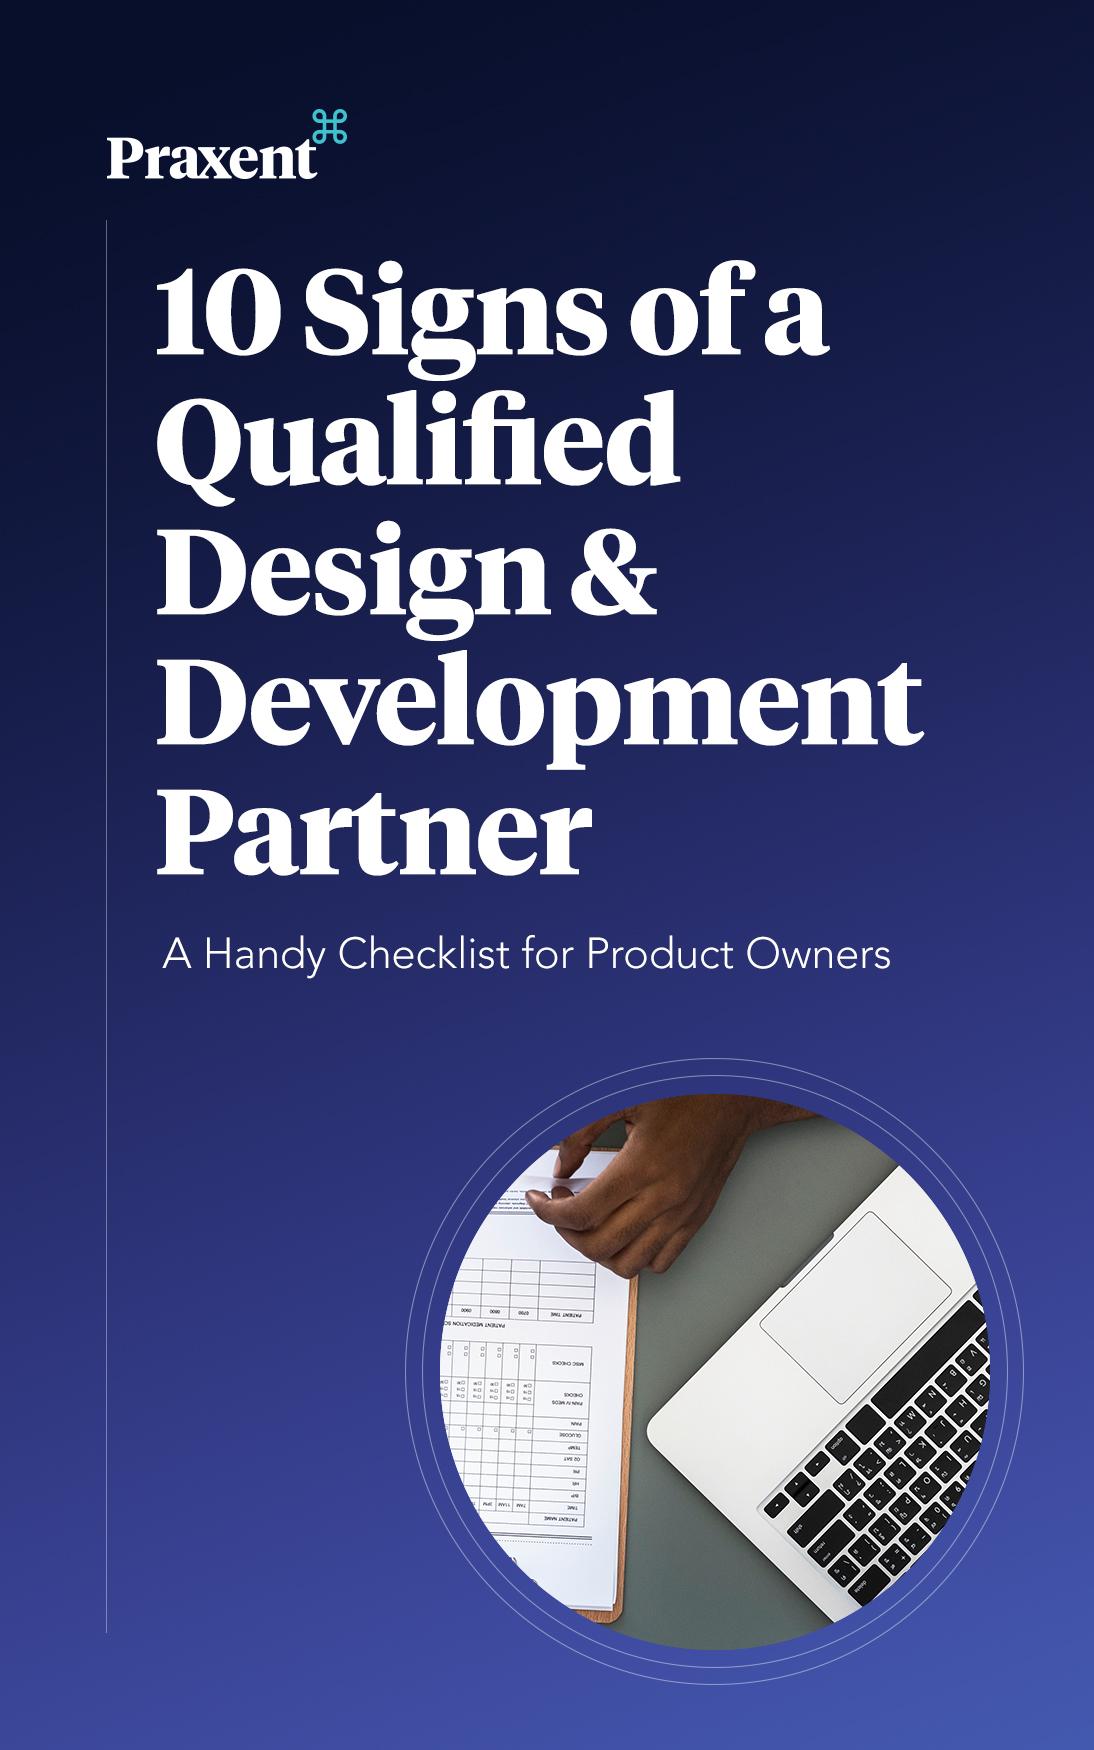 qualifieddesign-cover